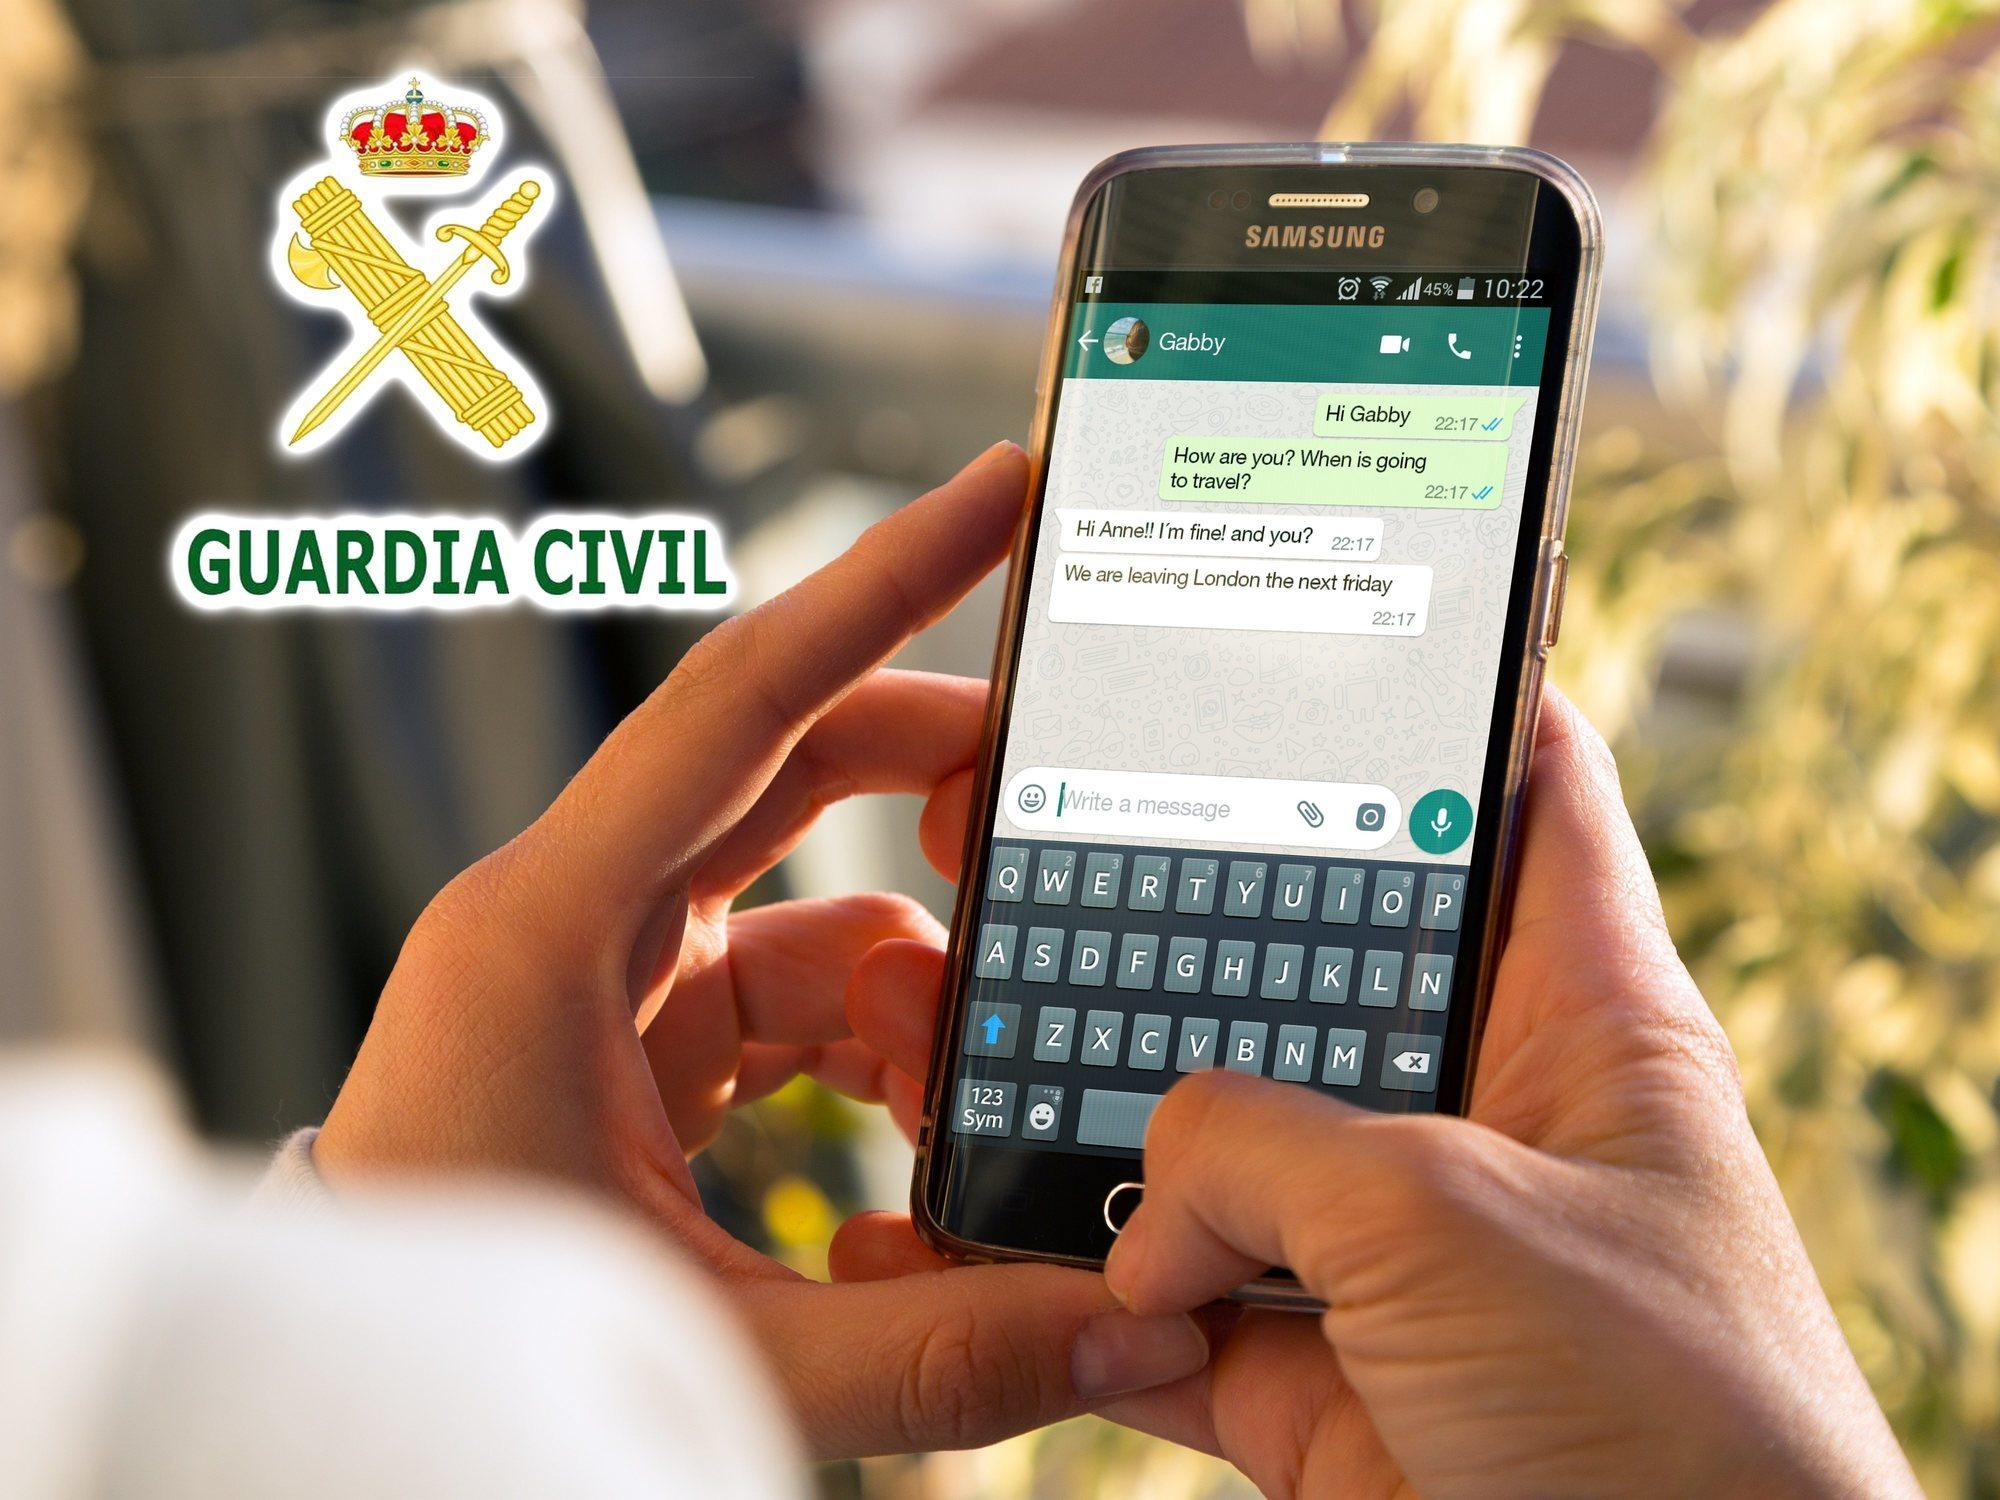 La Guardia Civil advierte sobre el riesgo del reto de WhatsApp del 'vecino de número'